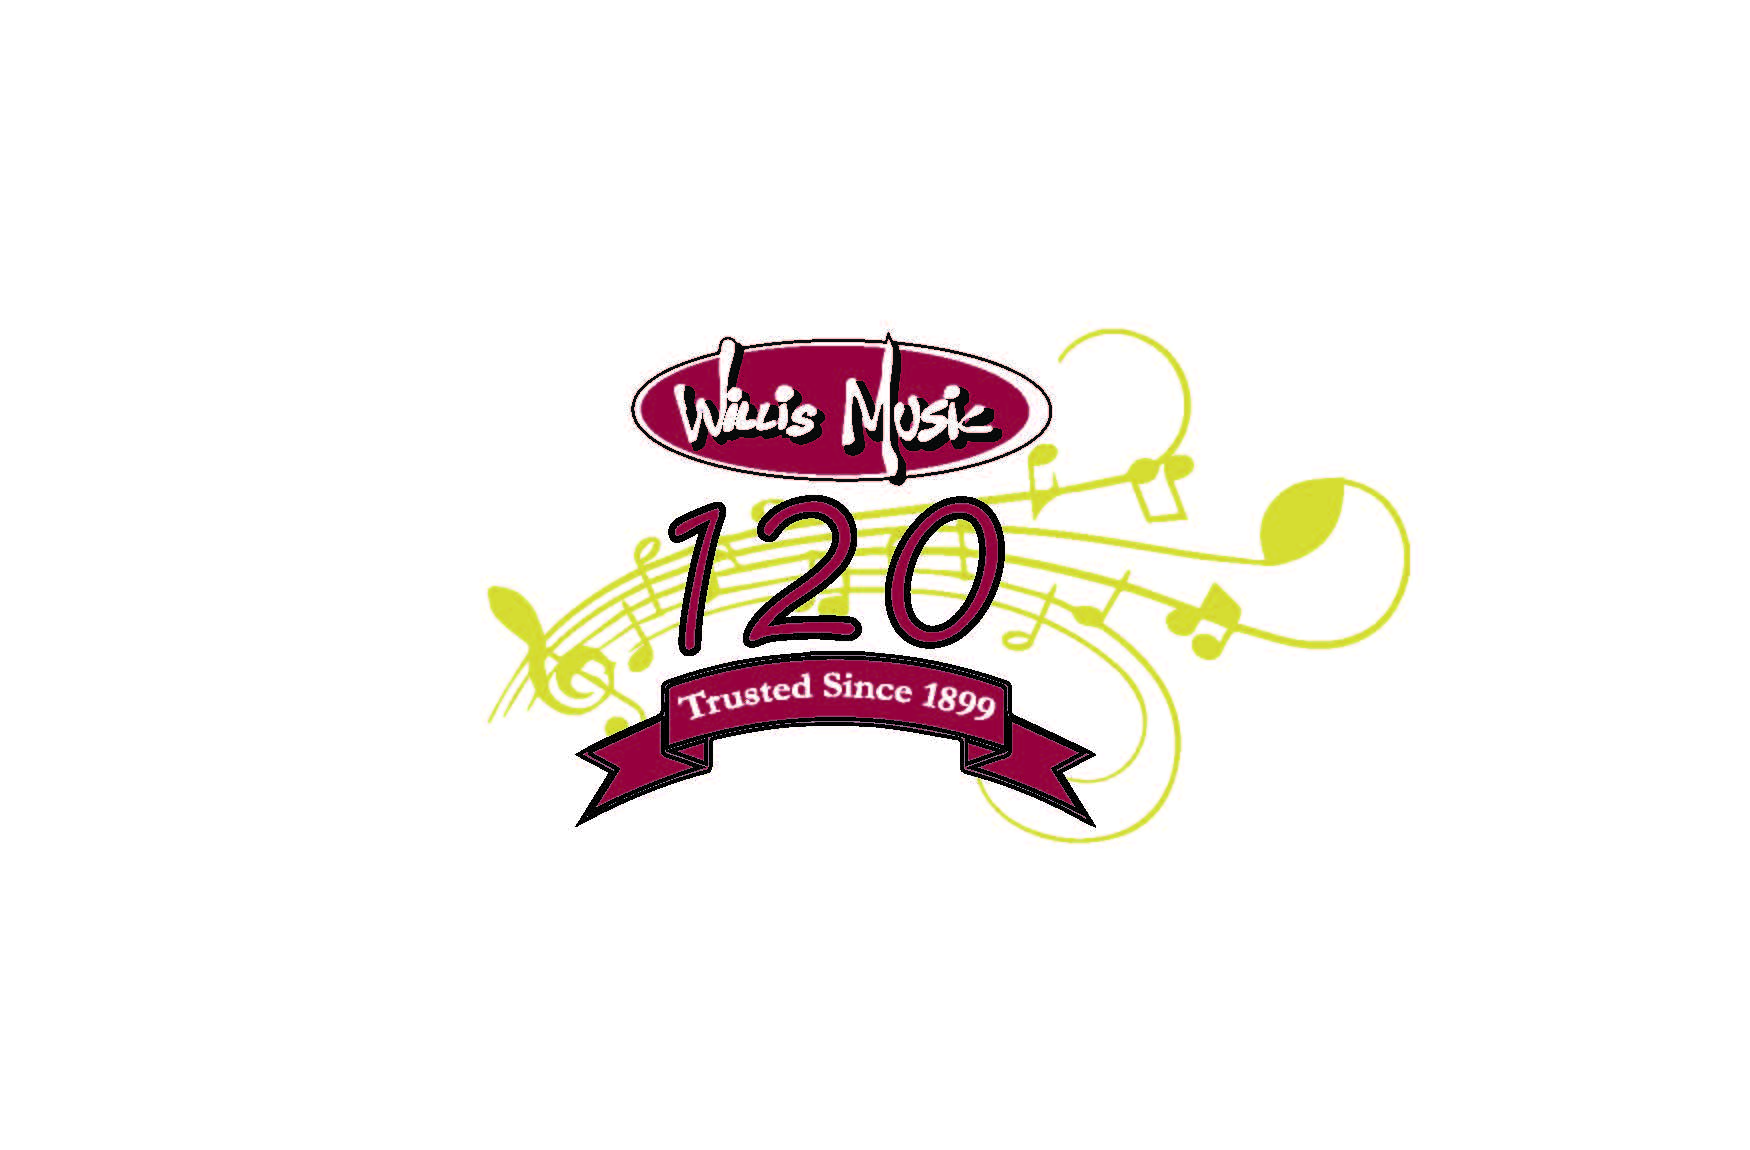 Willis Music 120 logo branding